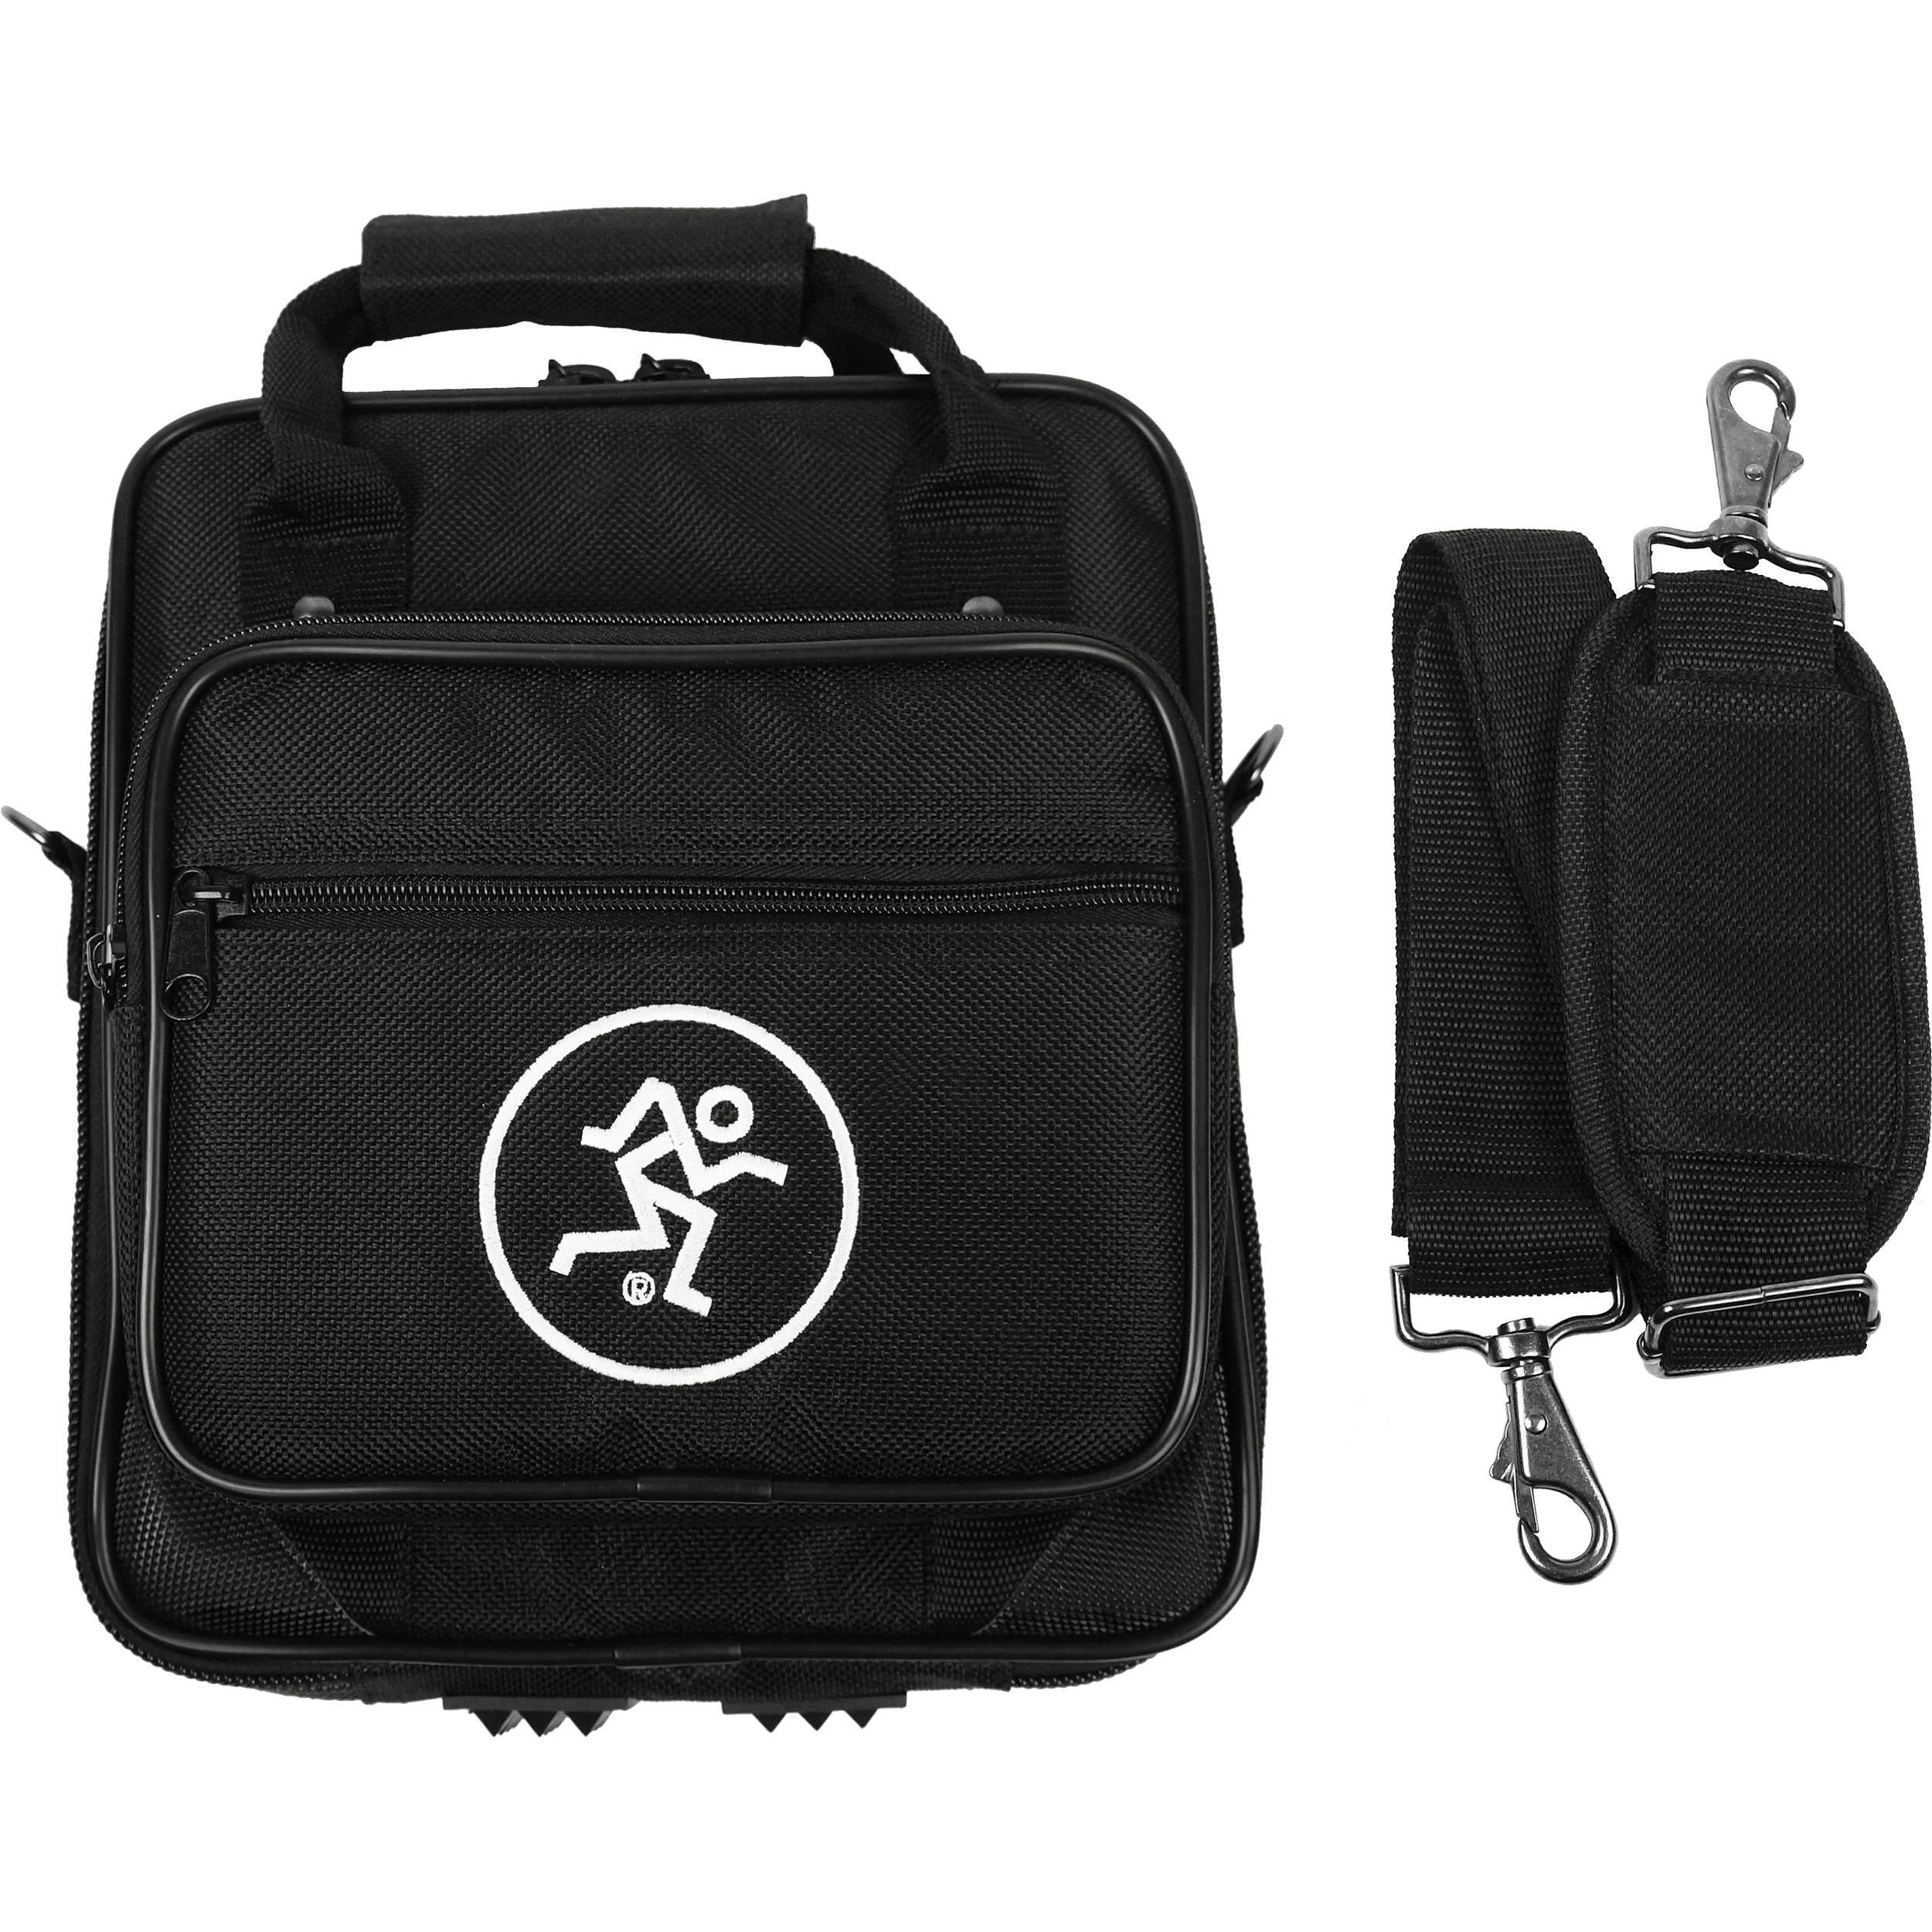 Mackie Bag For Profx4 V2 Mixer 0026024 02 Bh Photo Video Profx8